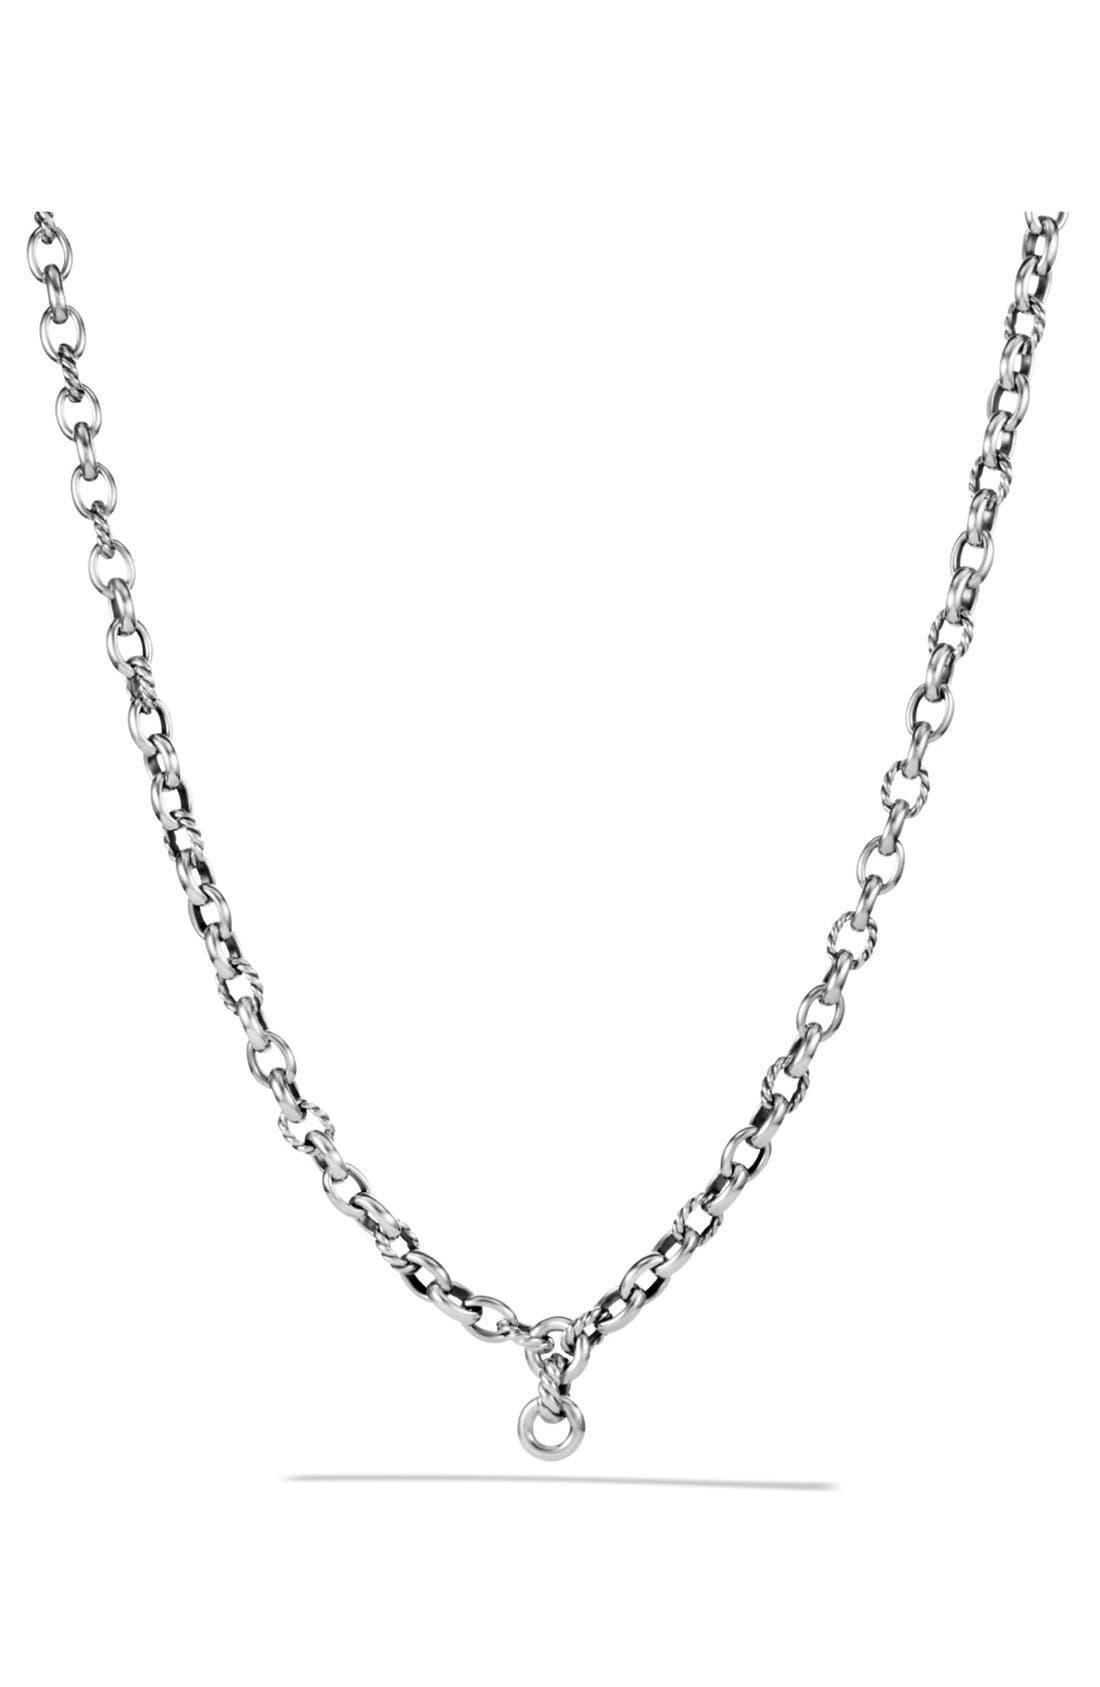 Main Image - David Yurman 'Chain' Oval Link Chain Necklace